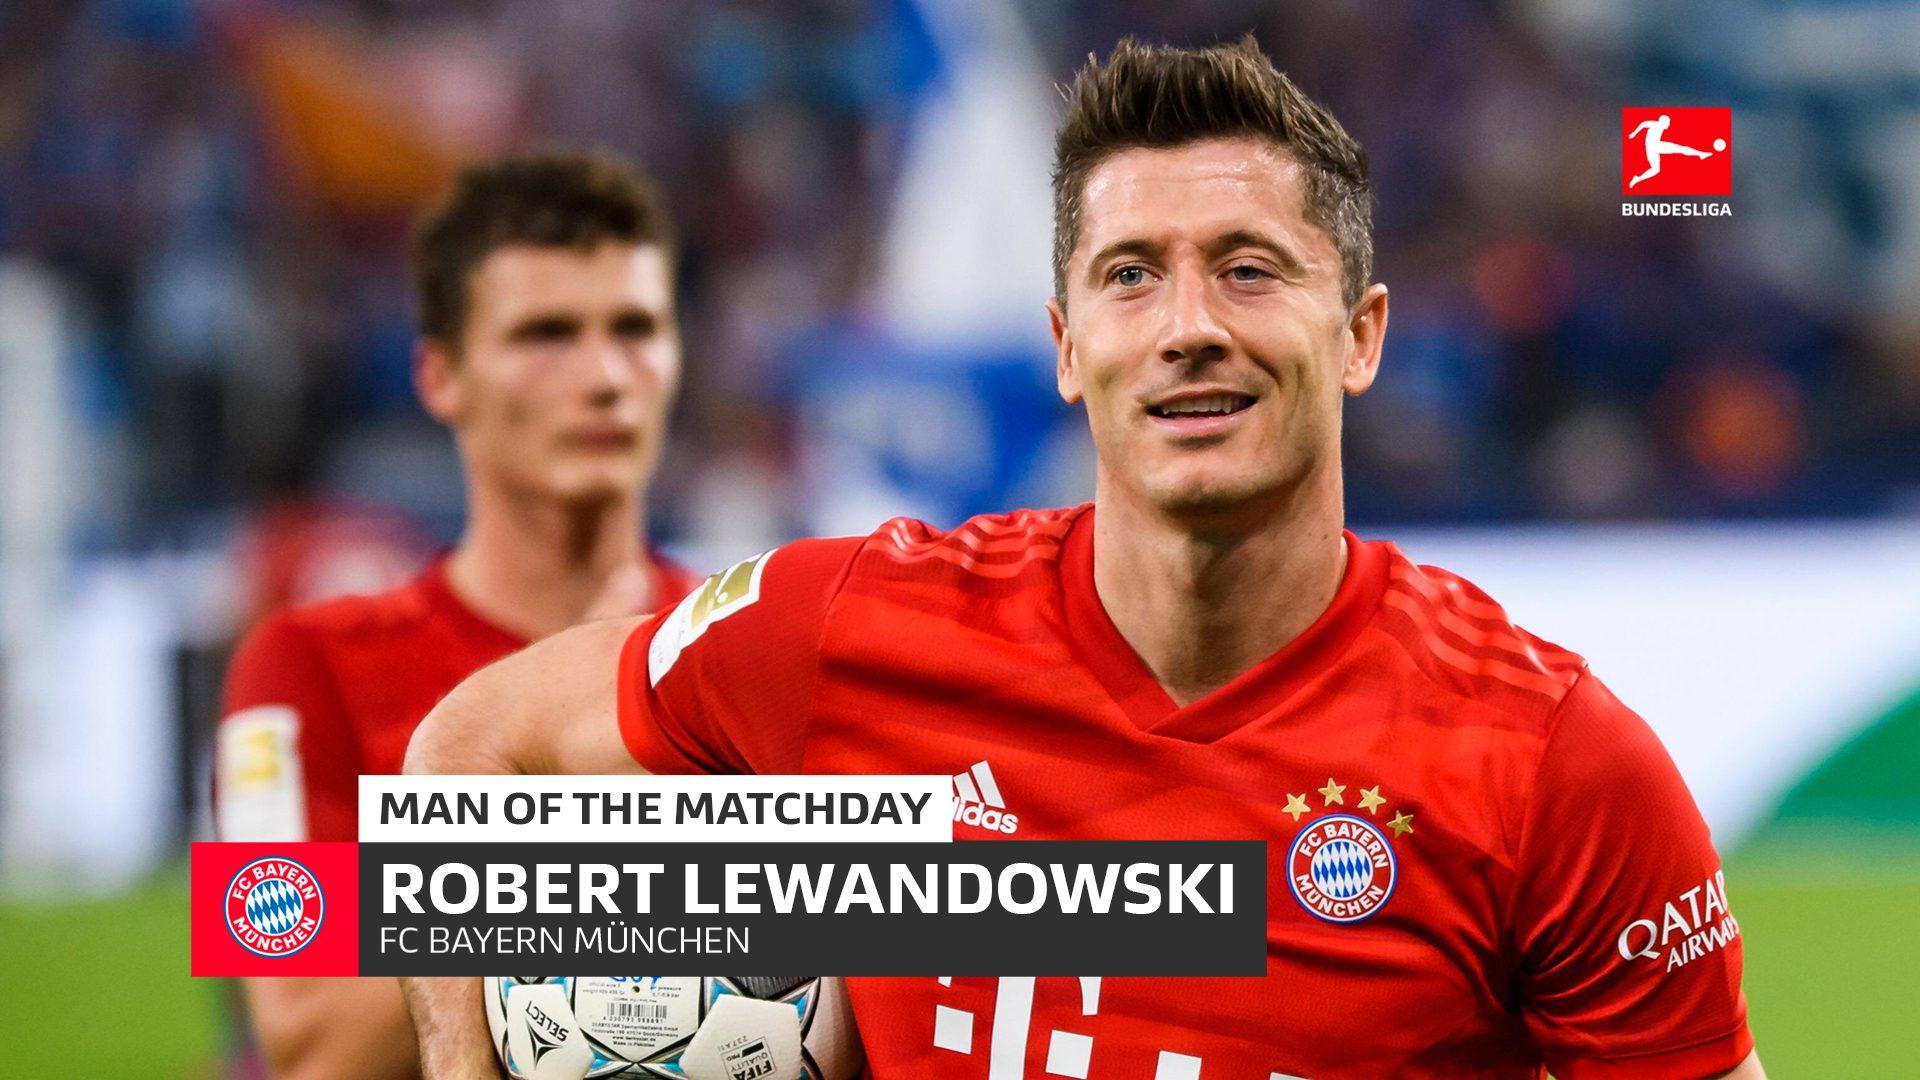 Bayern Munich's Robert Lewandowski: MD2's Man of the Matchday vows to keep improving